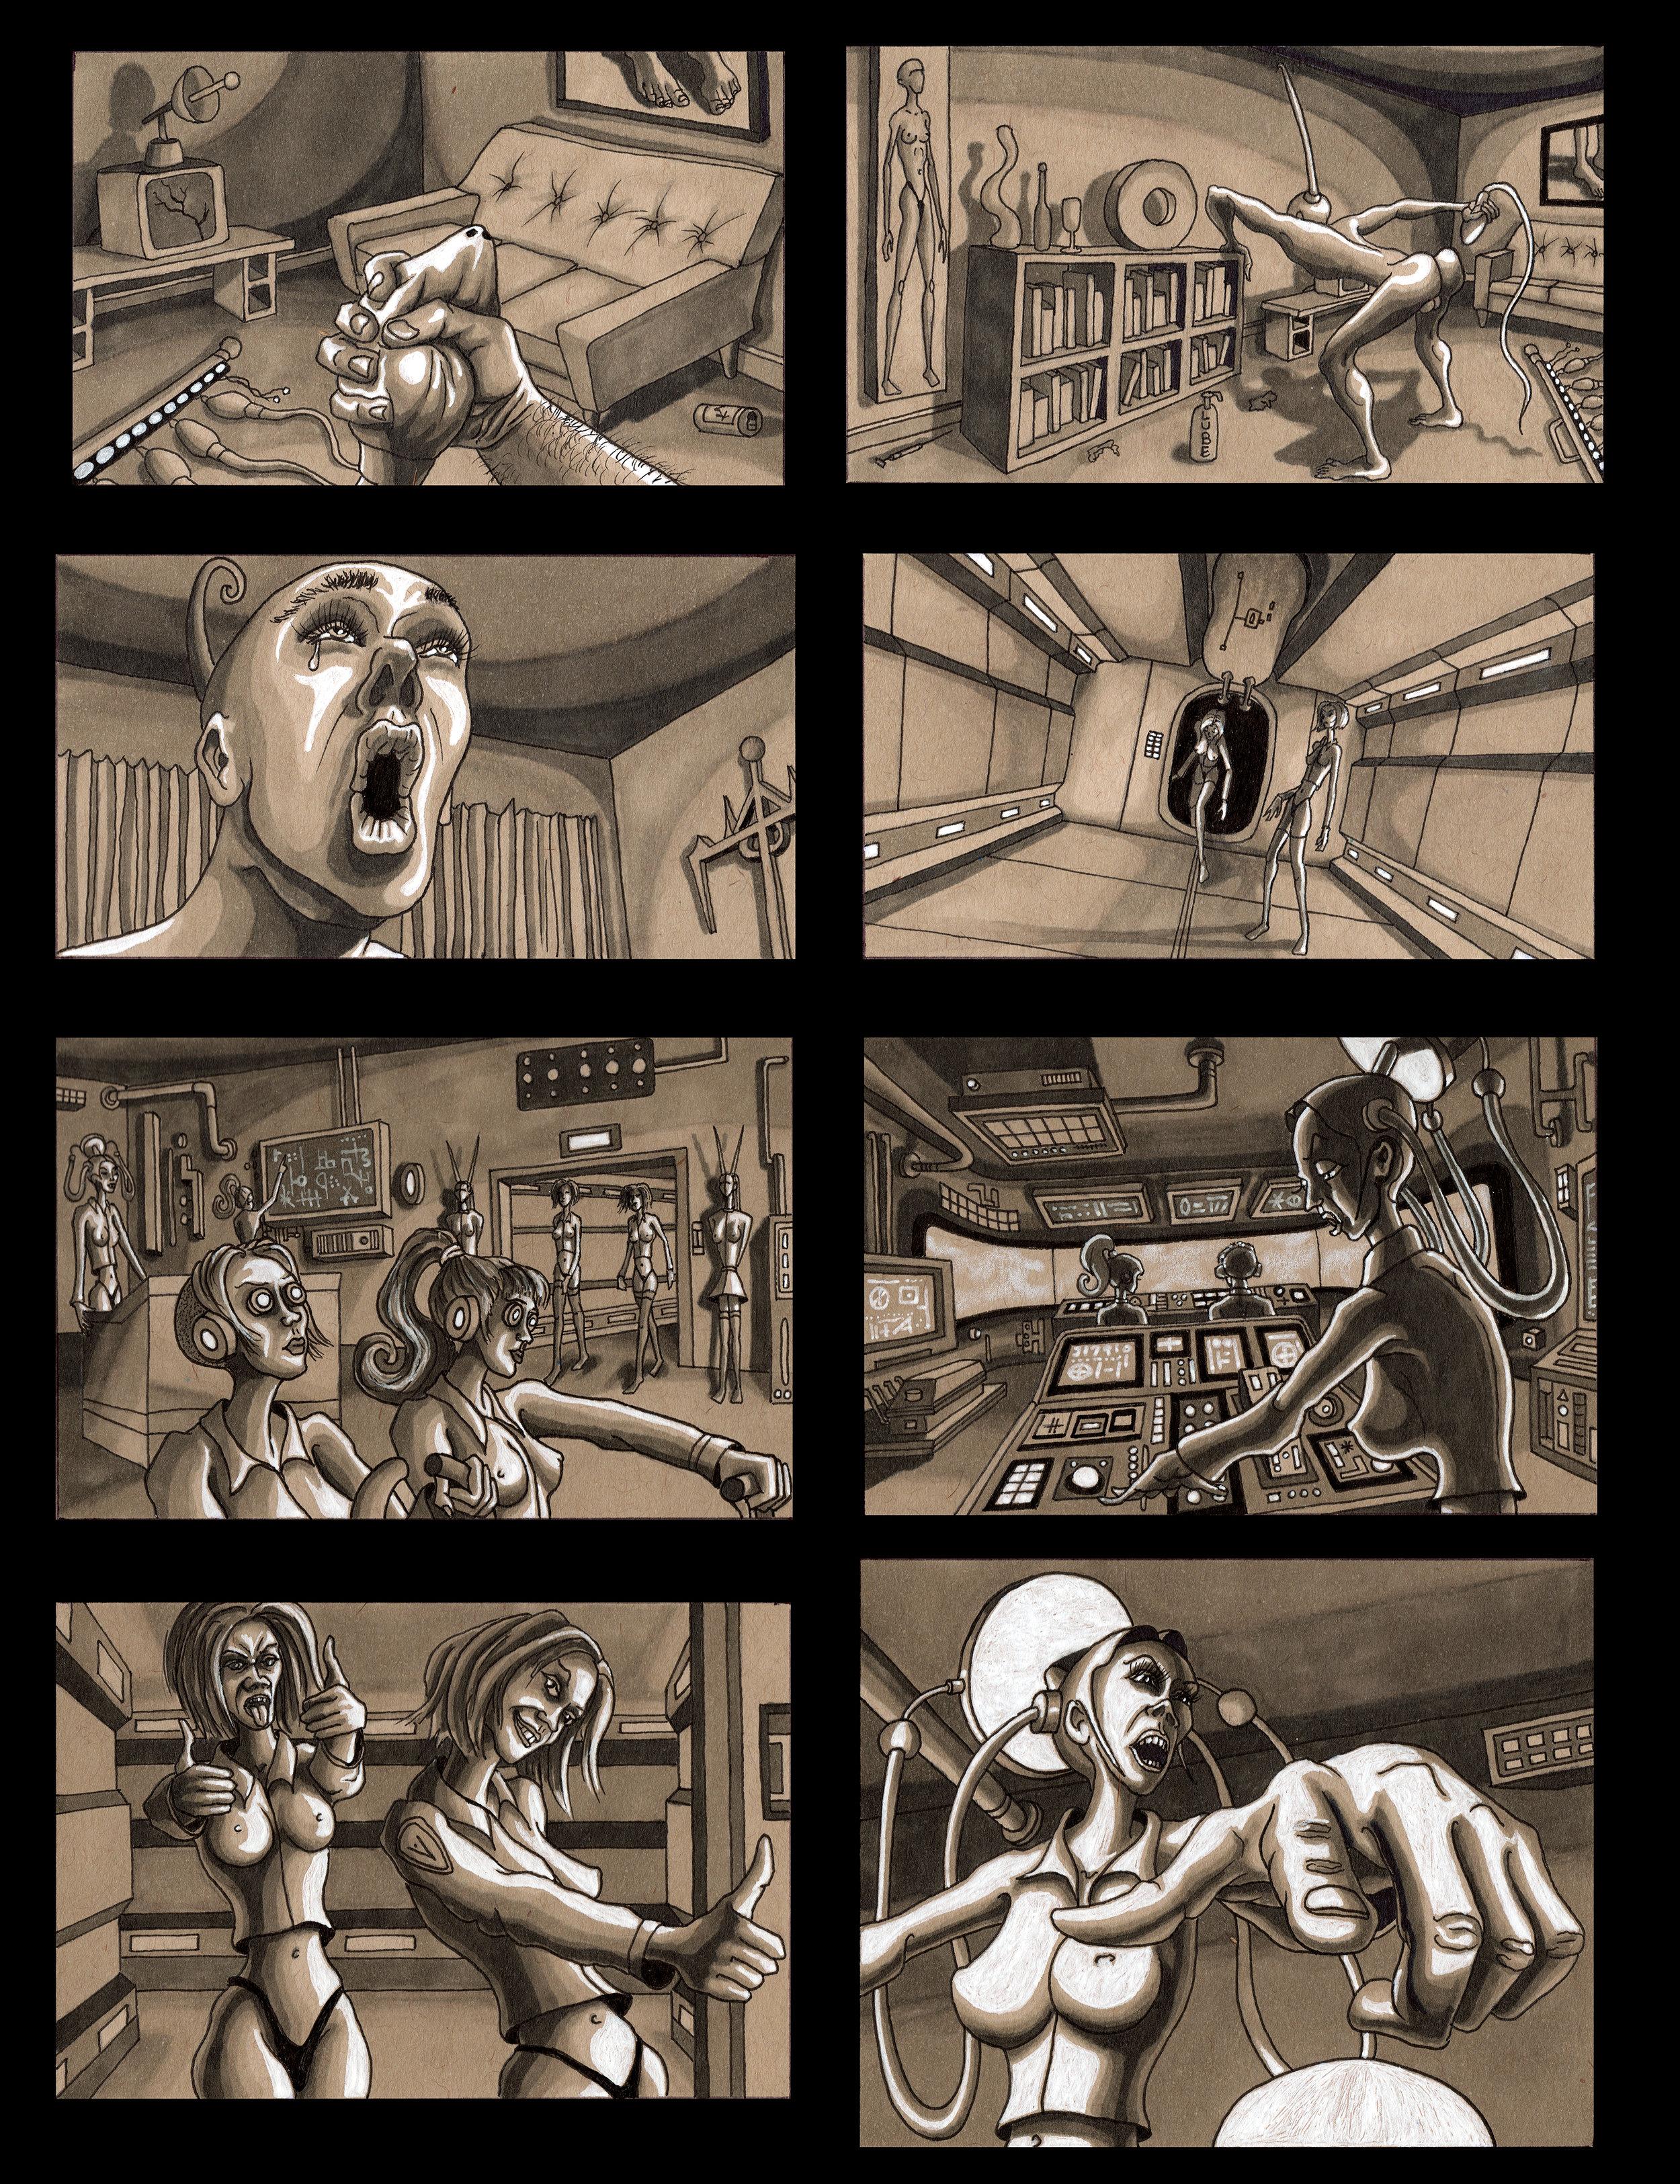 Every Woahman for Itself - page 5